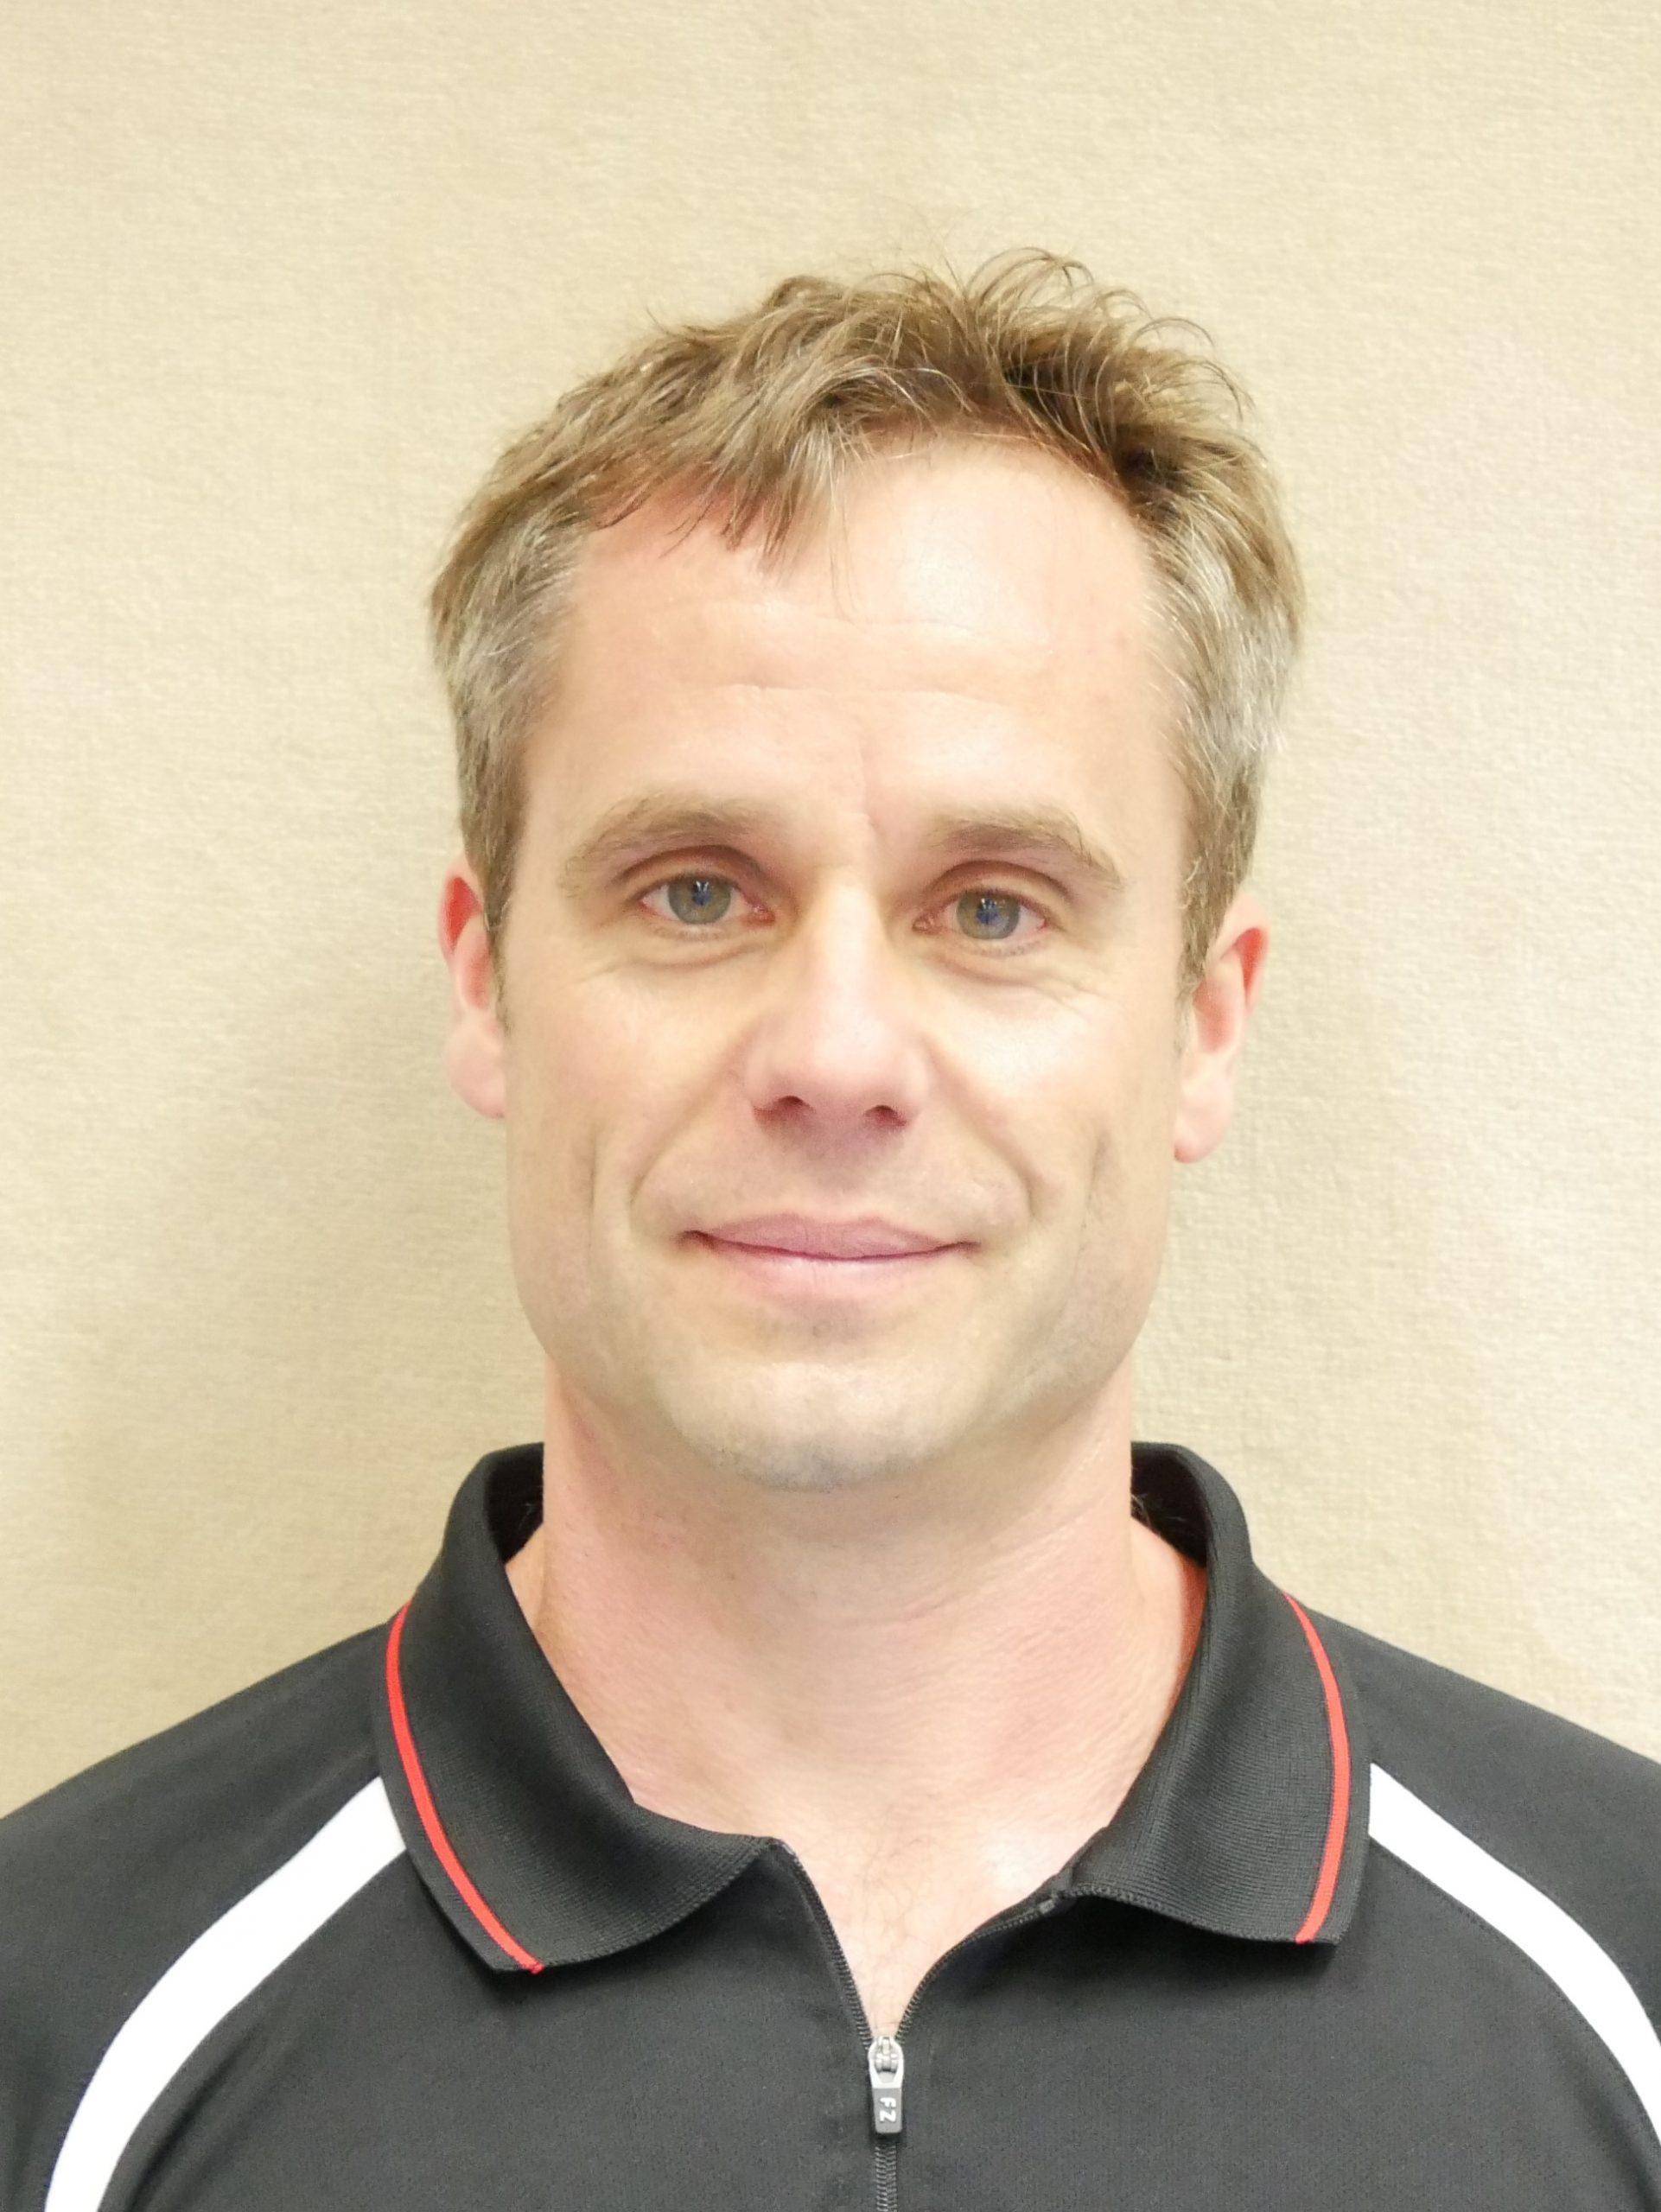 Michael Küpper